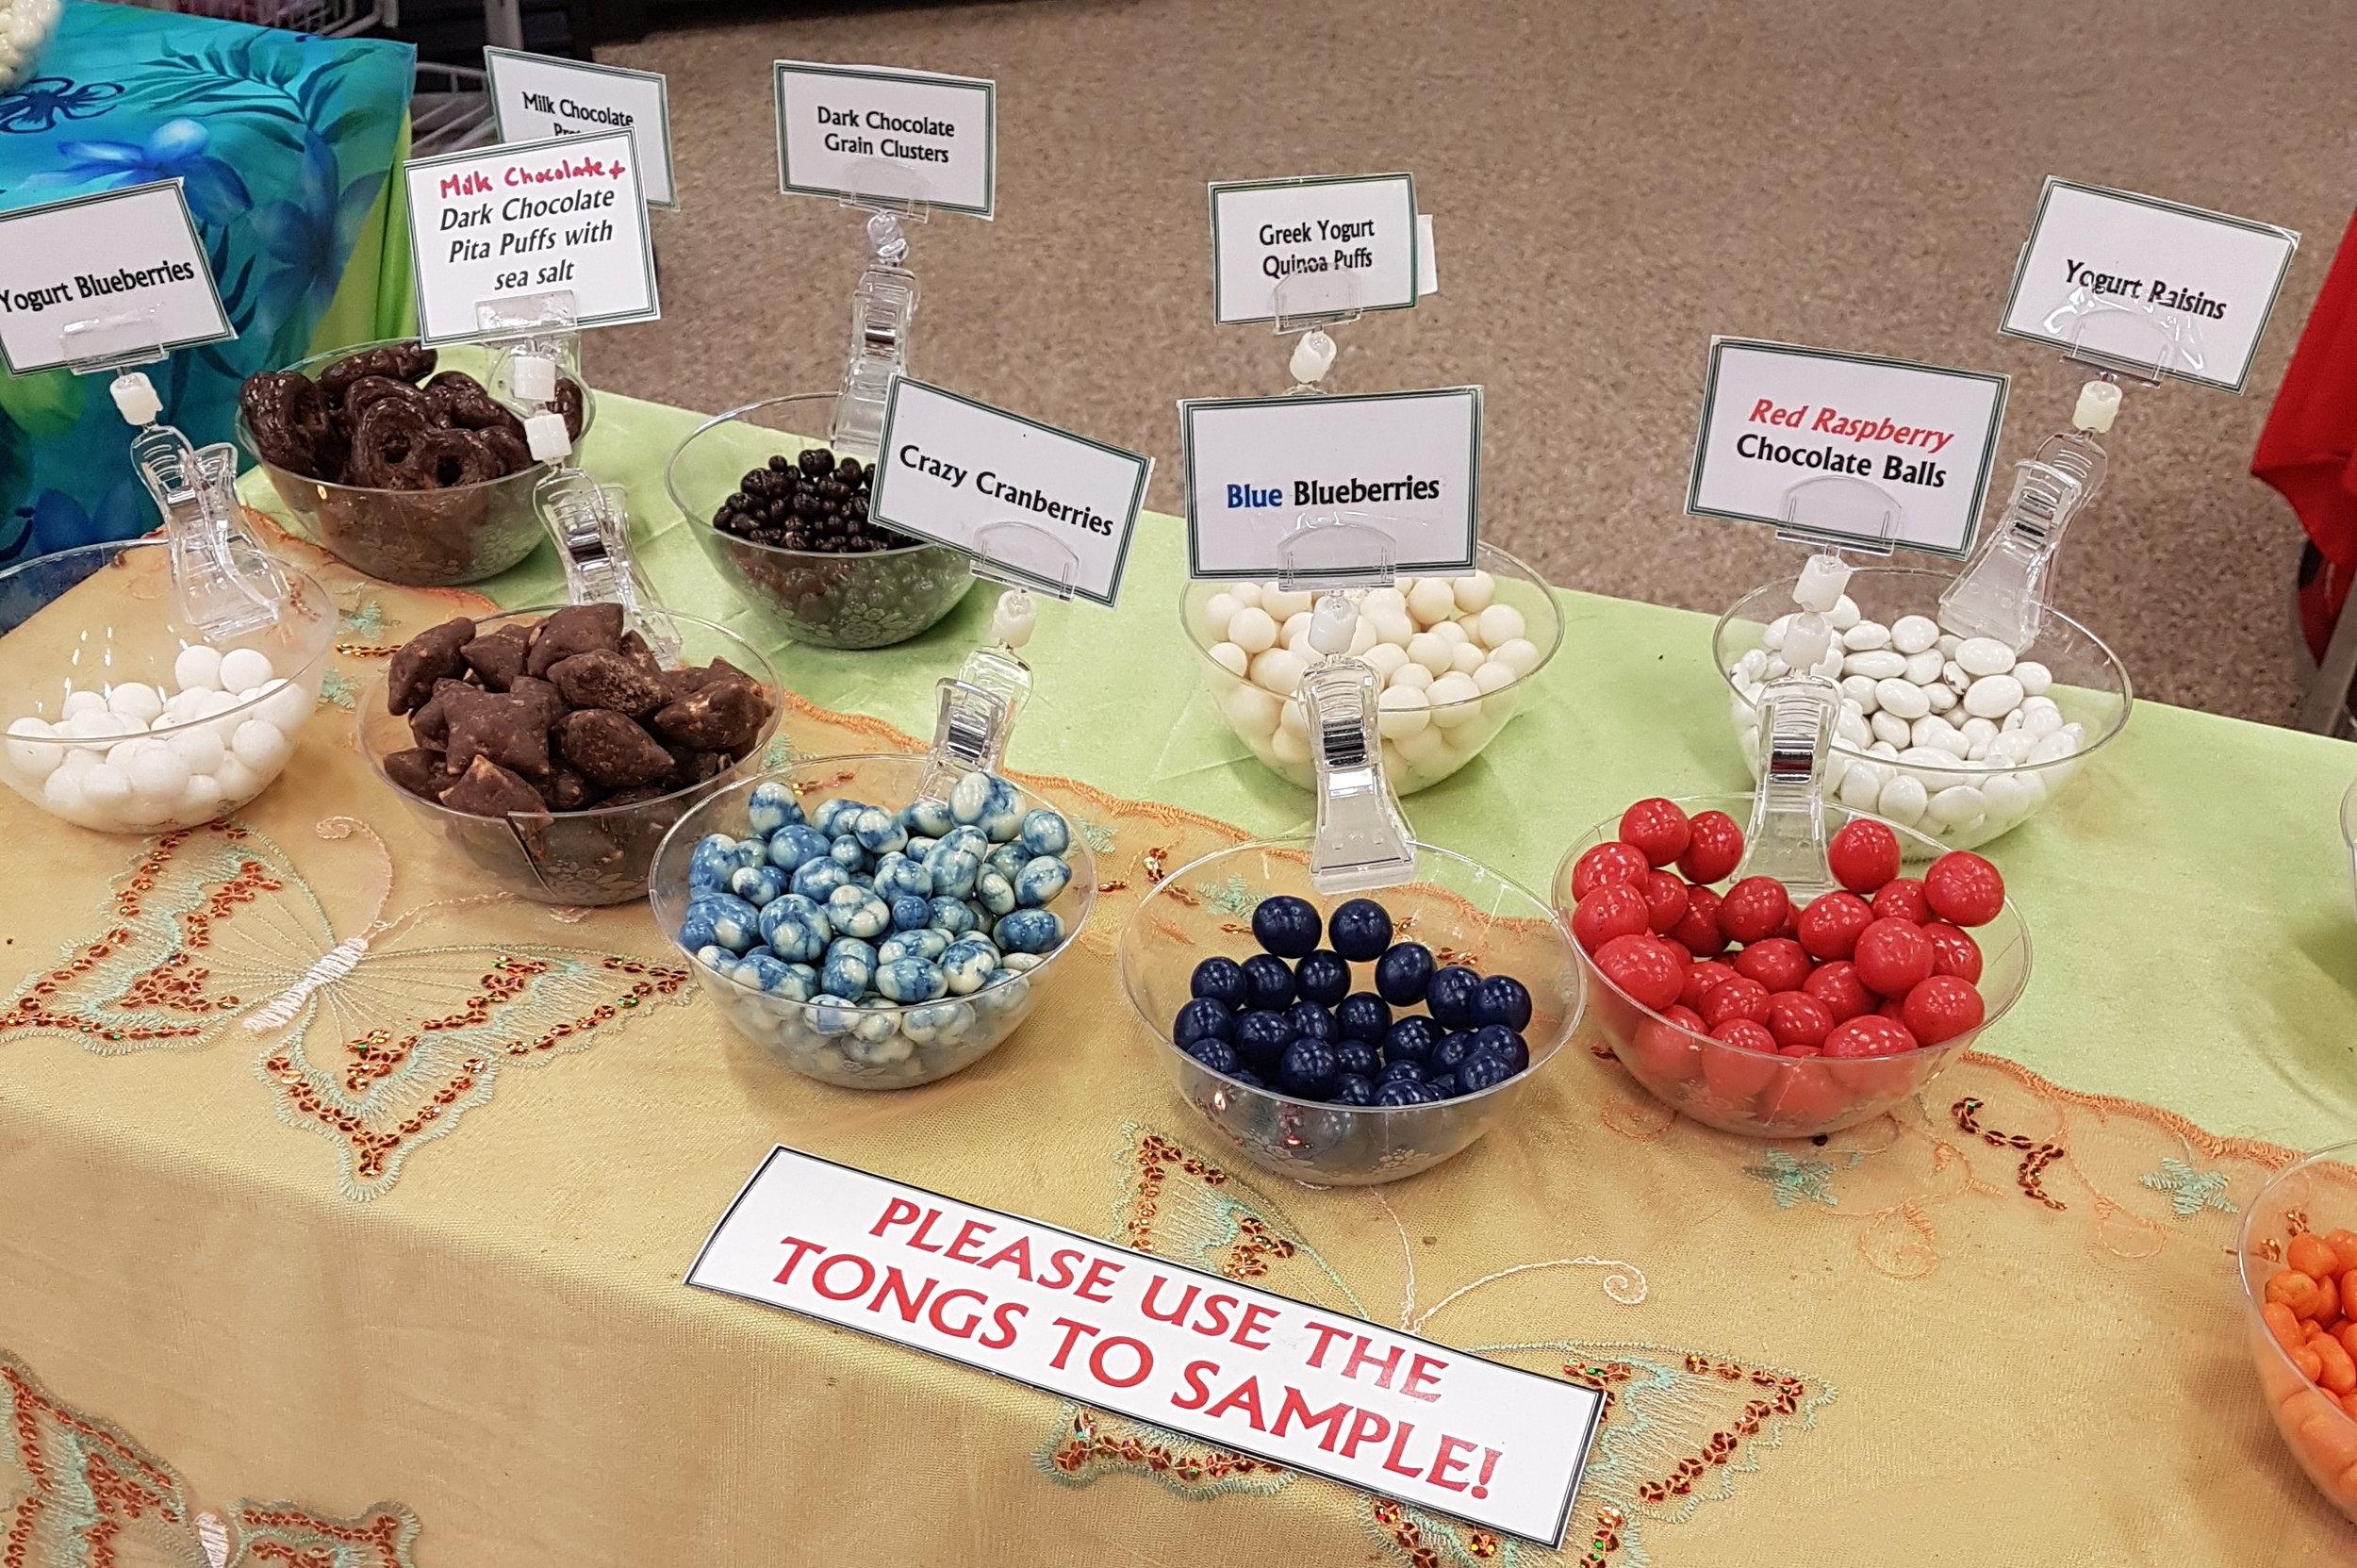 Chocolate samples!